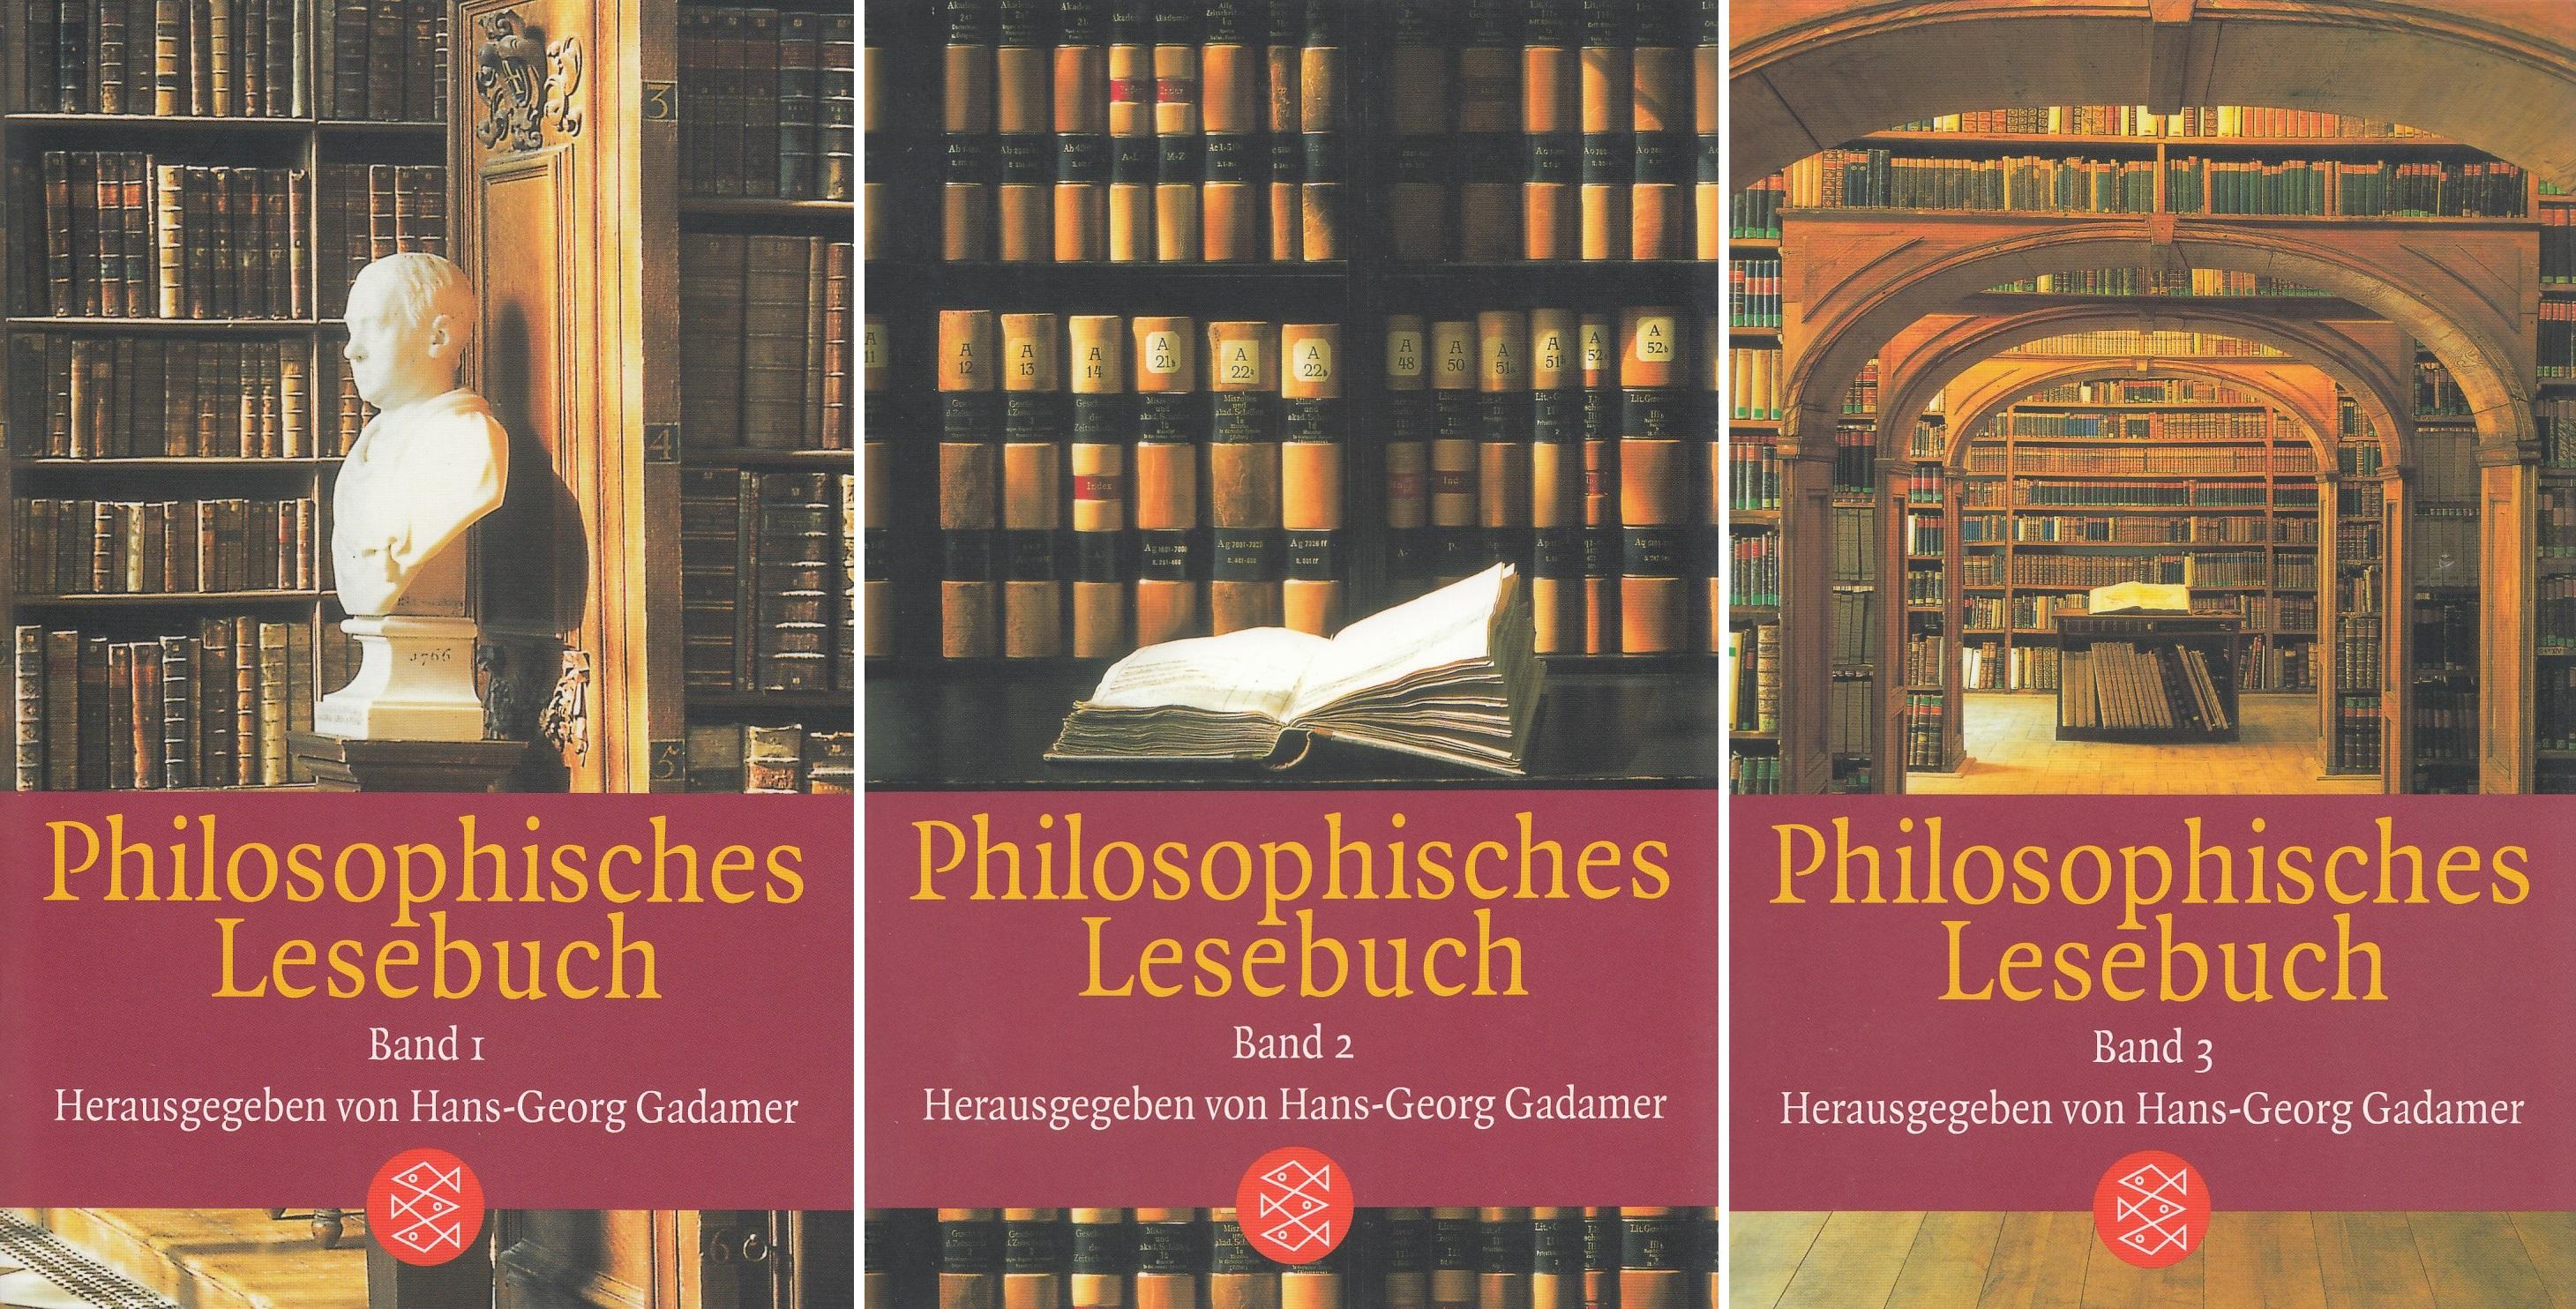 Philosphisches Lesebuch, 3 Bde.